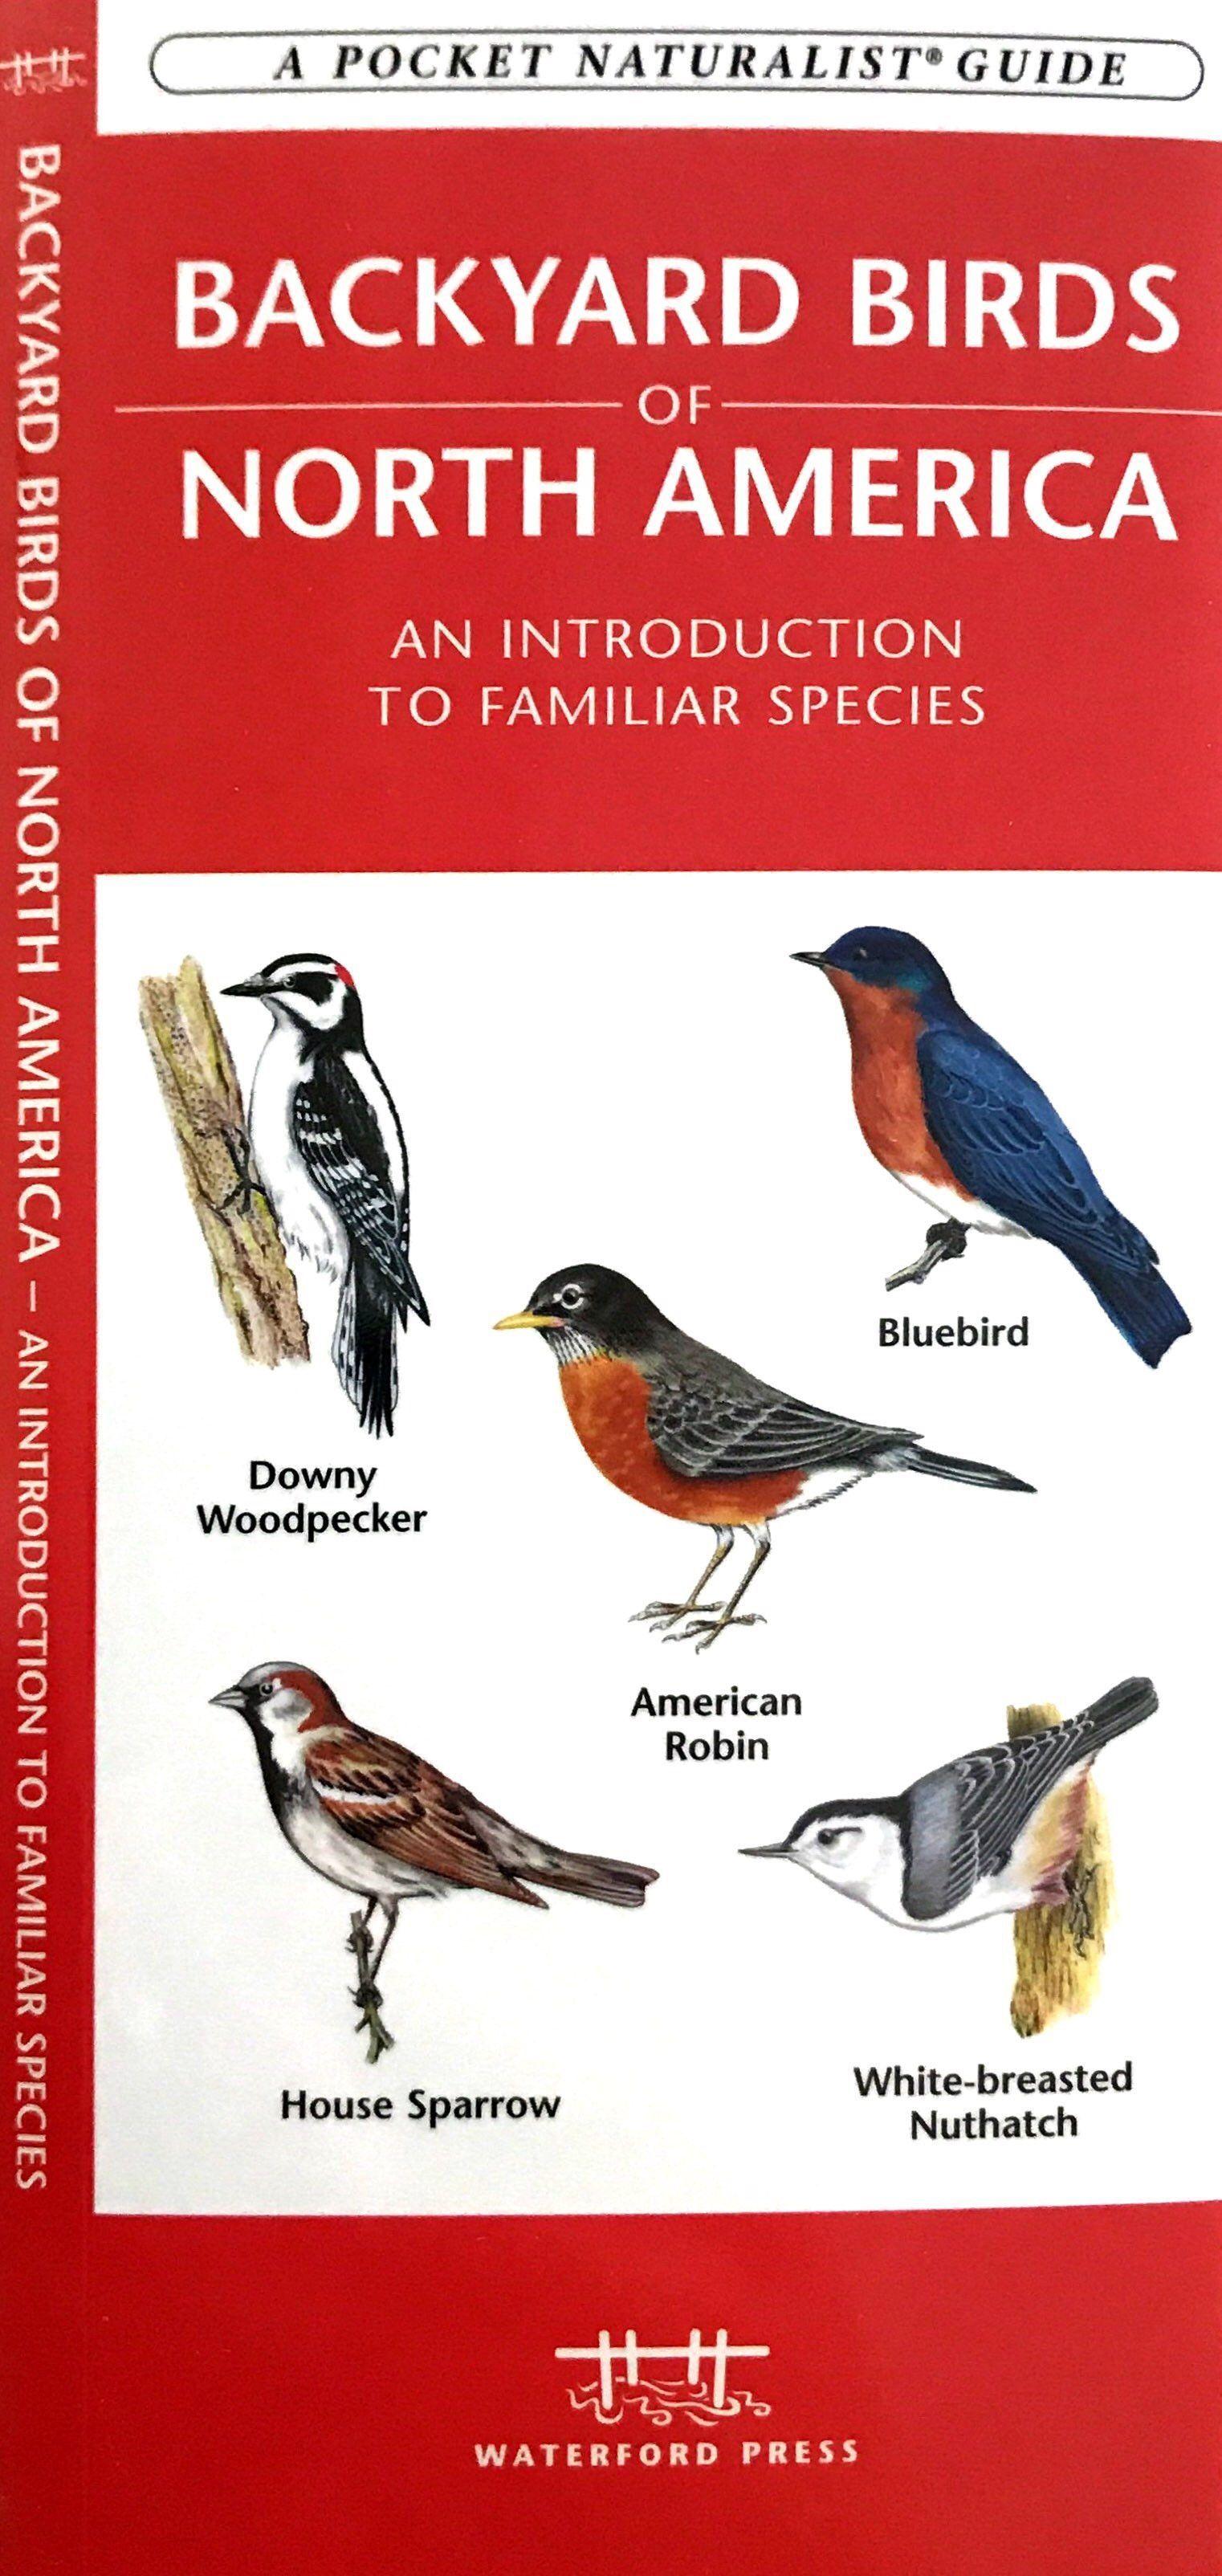 BACKYARD BIRDS OF NORTH AMERICA | Backyard birds, Backyard ...